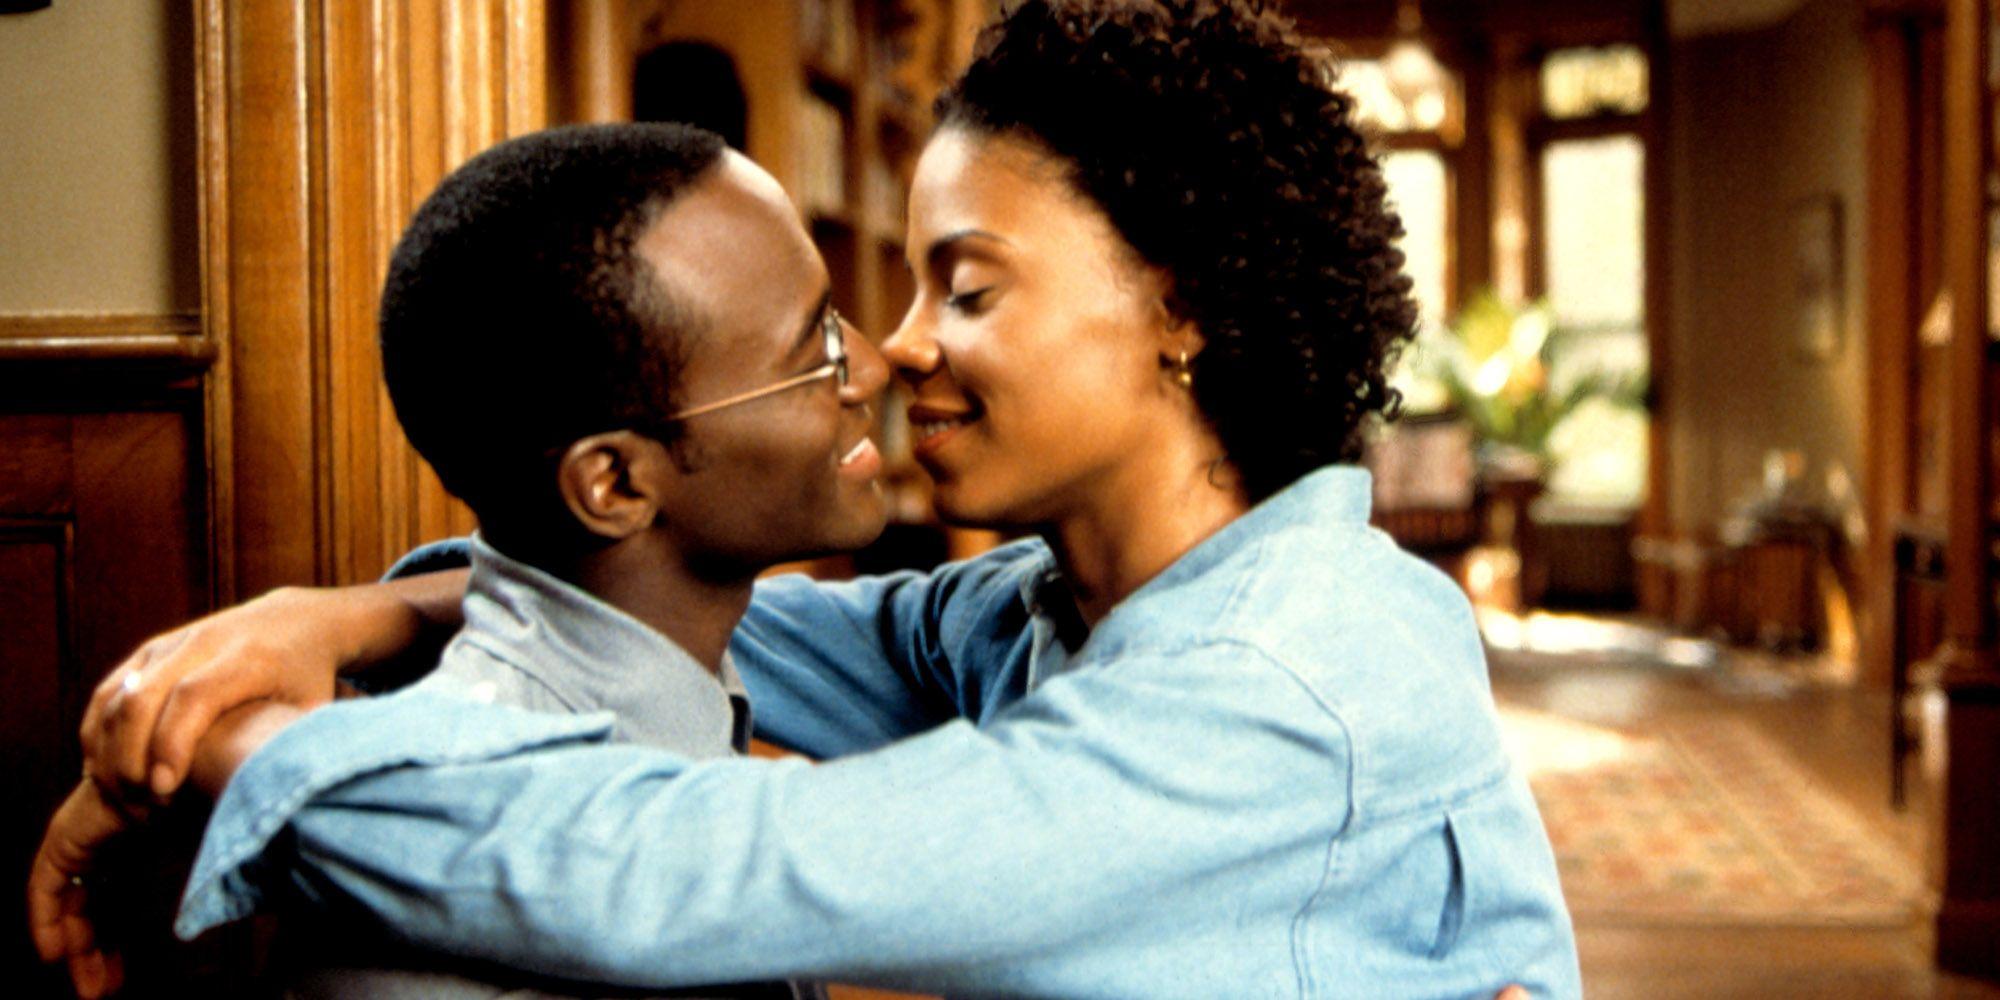 amore Unleashed dating recensioni Christian single sito di incontri in Kenya